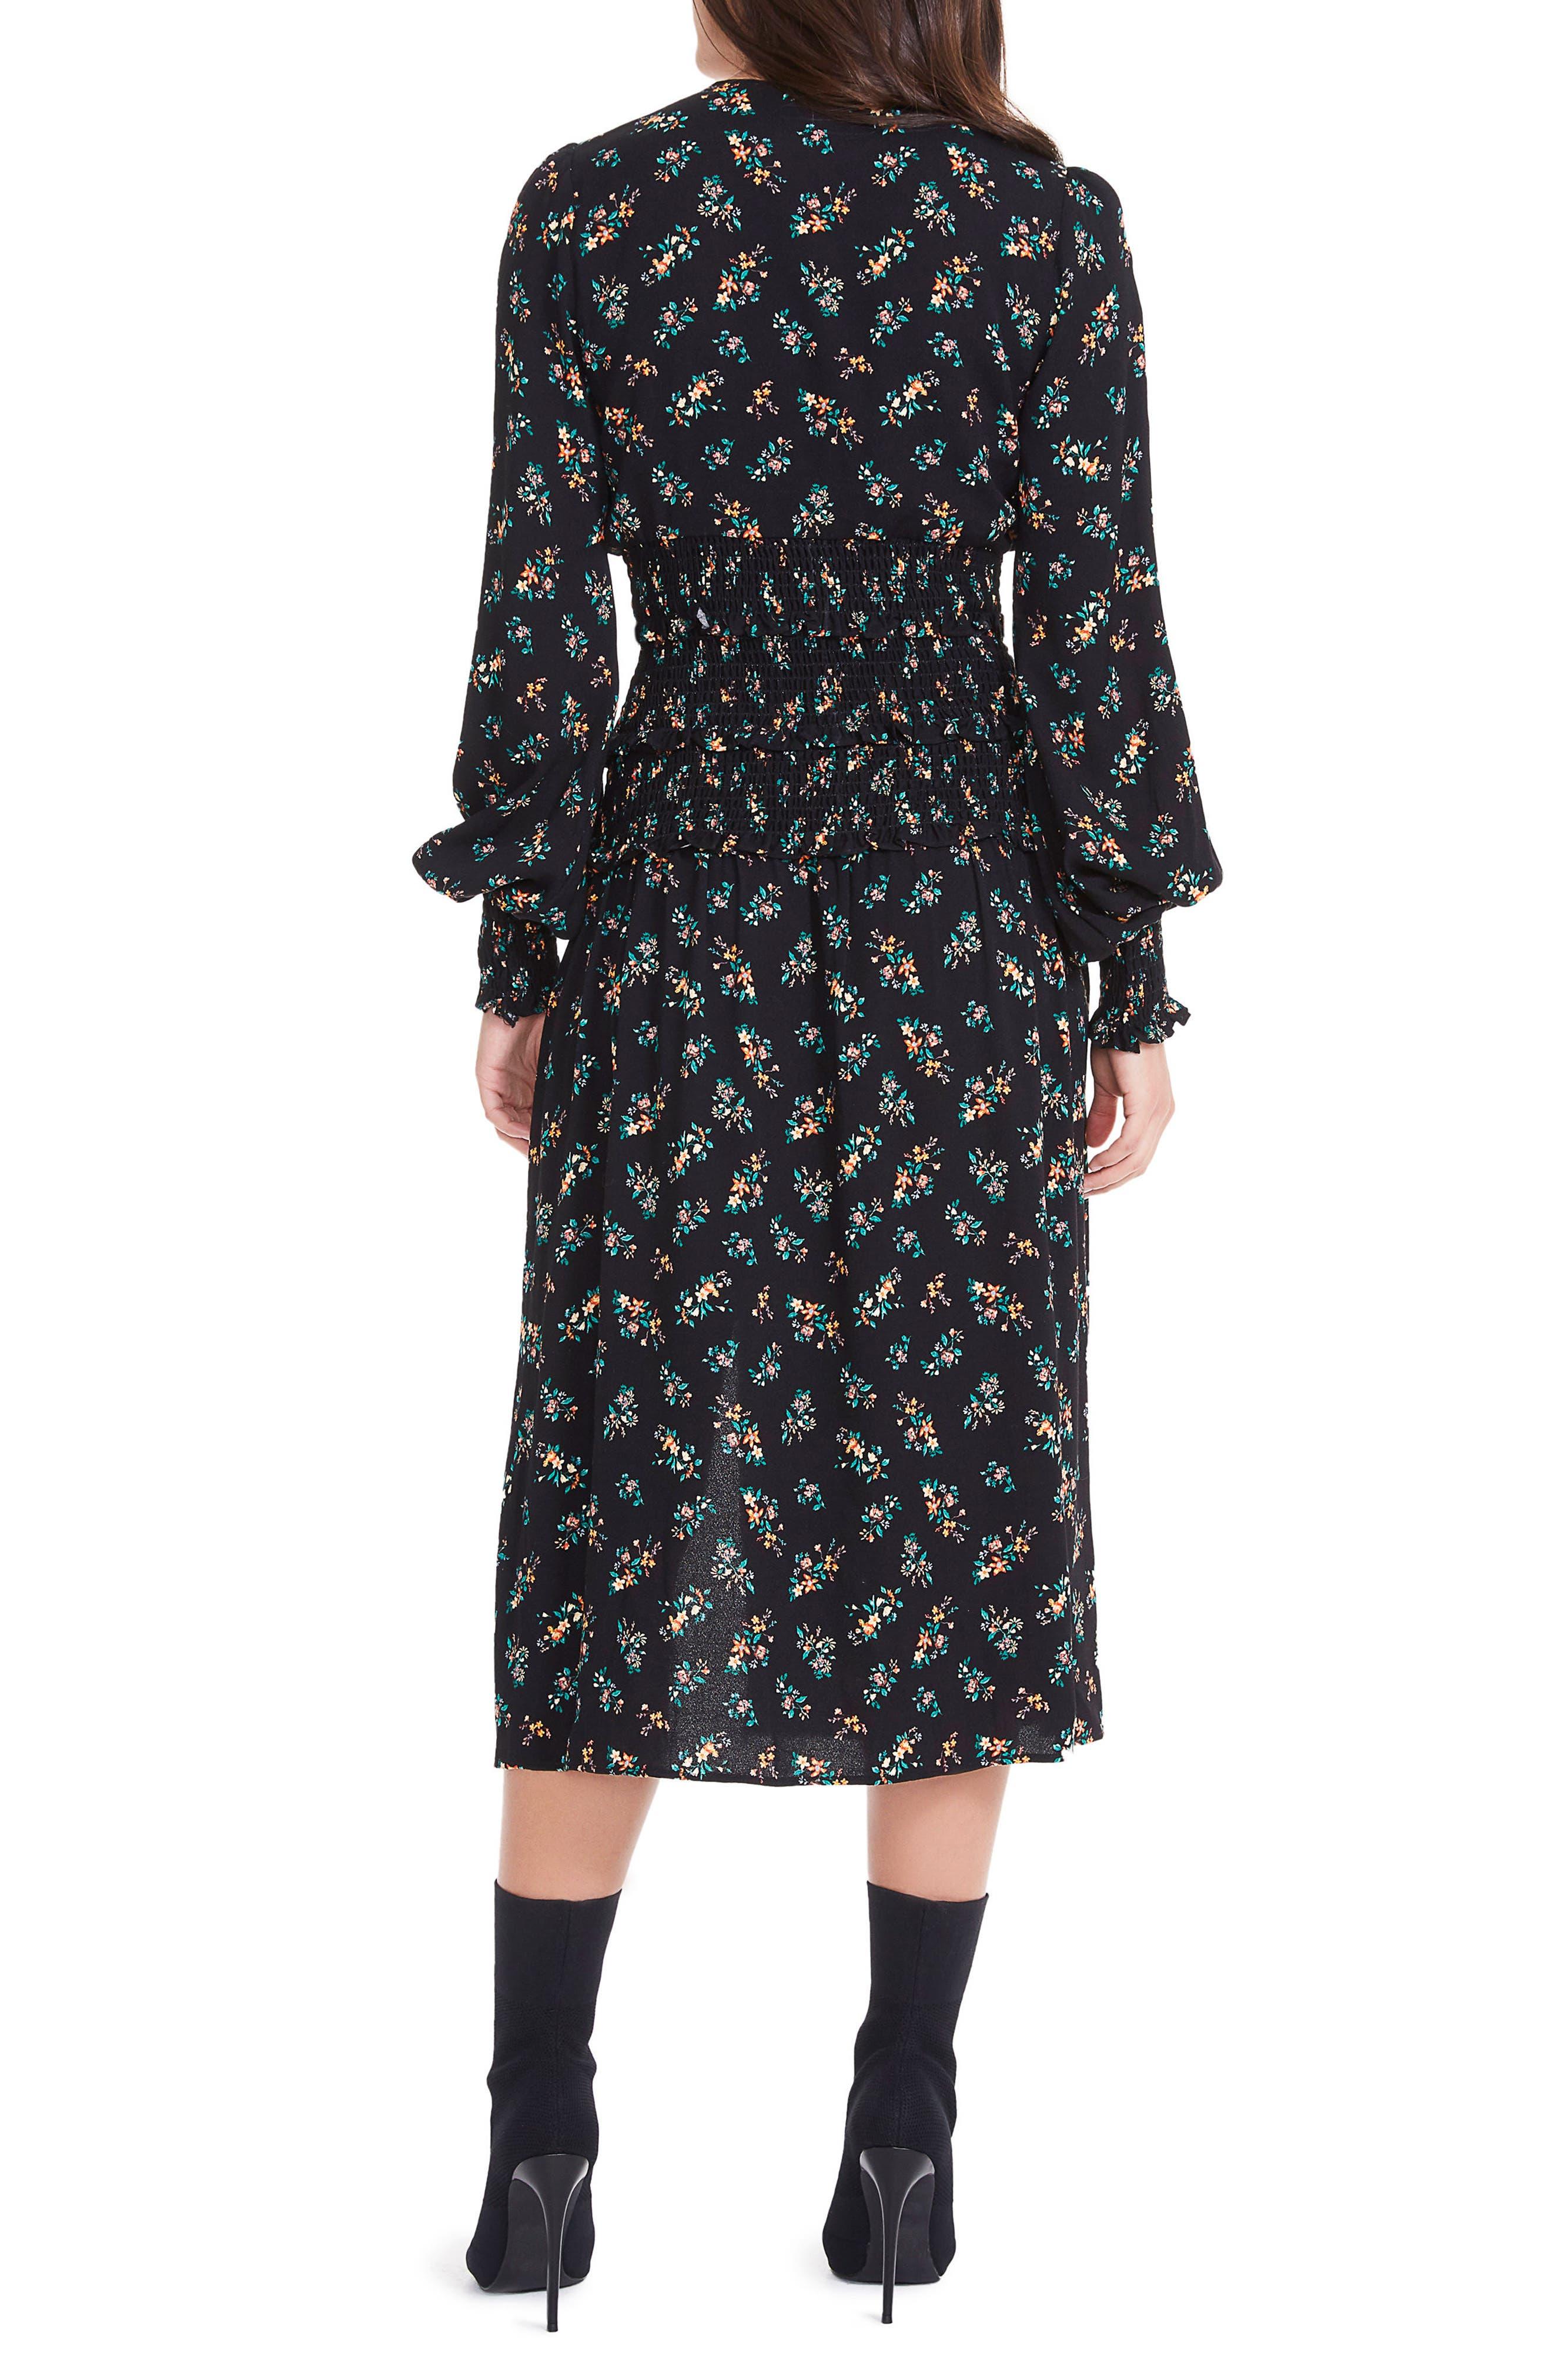 Hazel Smocked Midi Dress,                             Alternate thumbnail 2, color,                             001